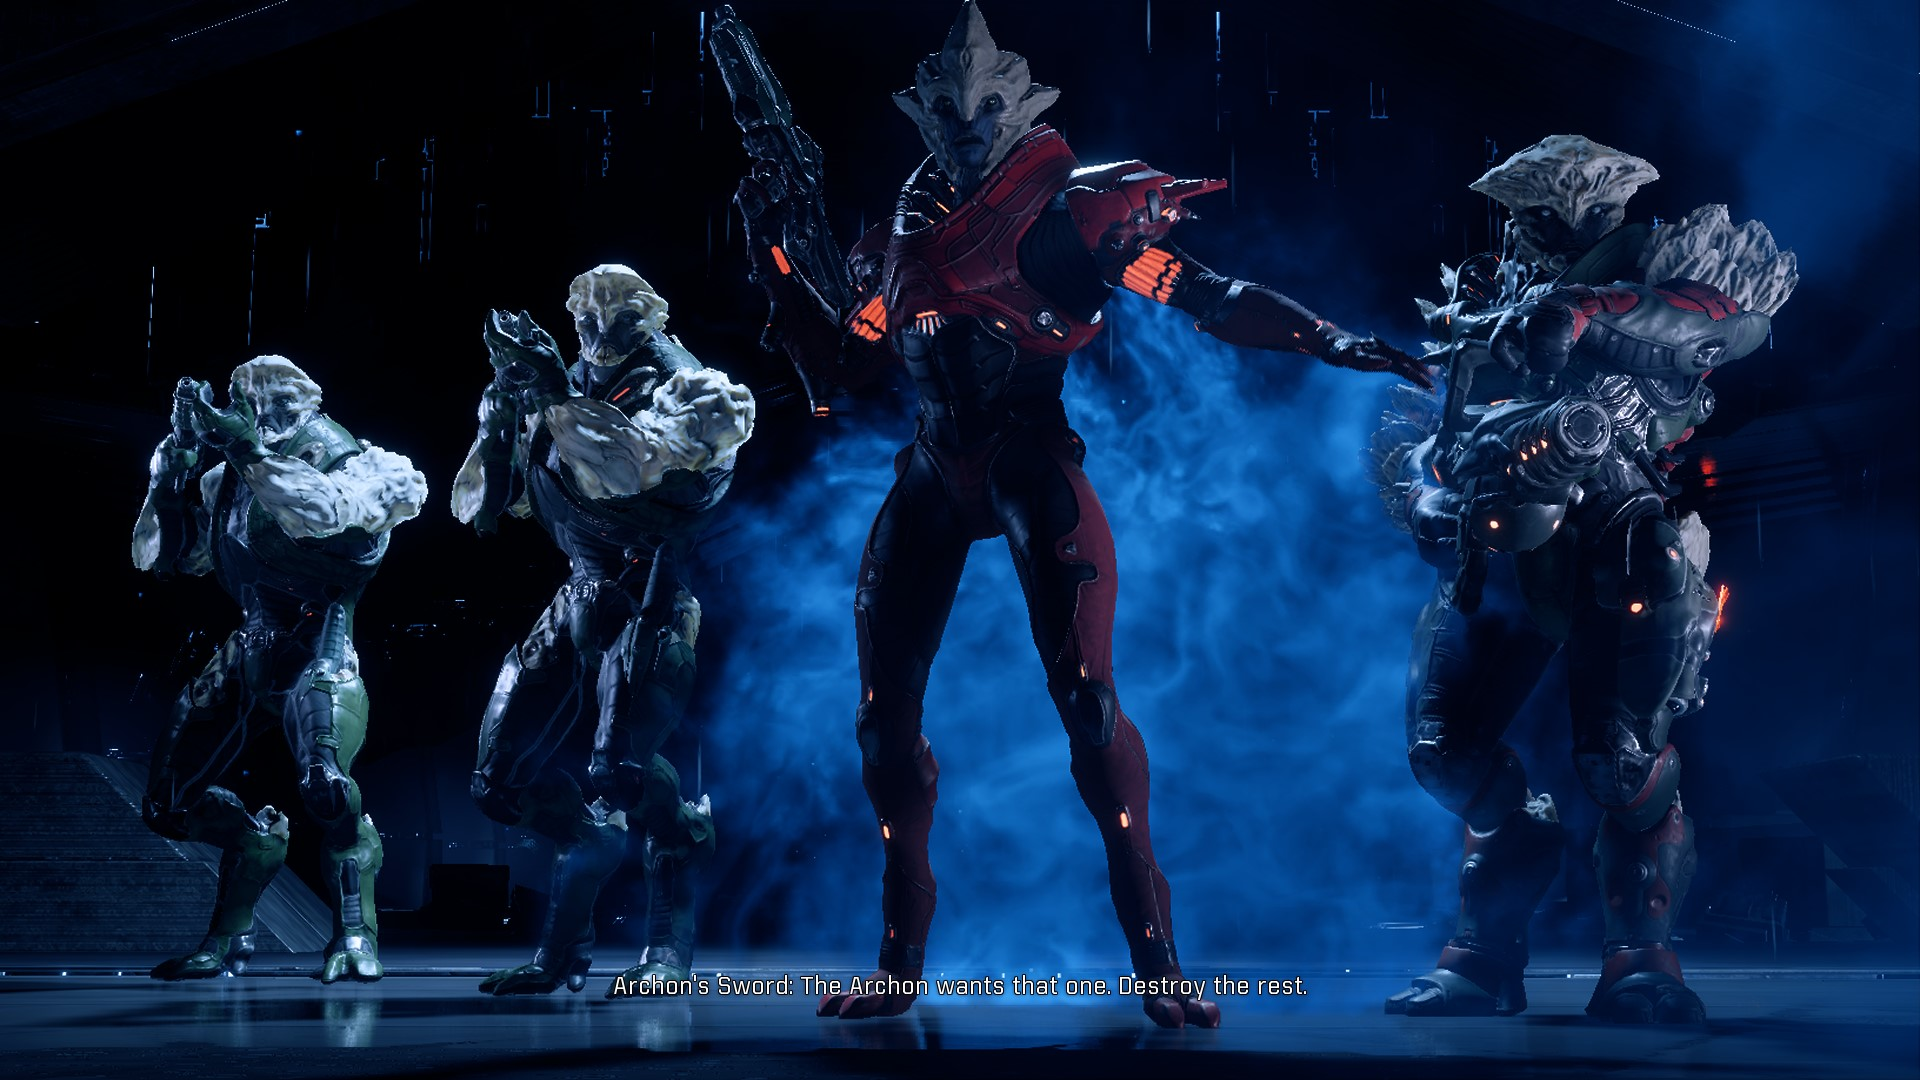 Mass Effect Andromeda 0348 Adrift